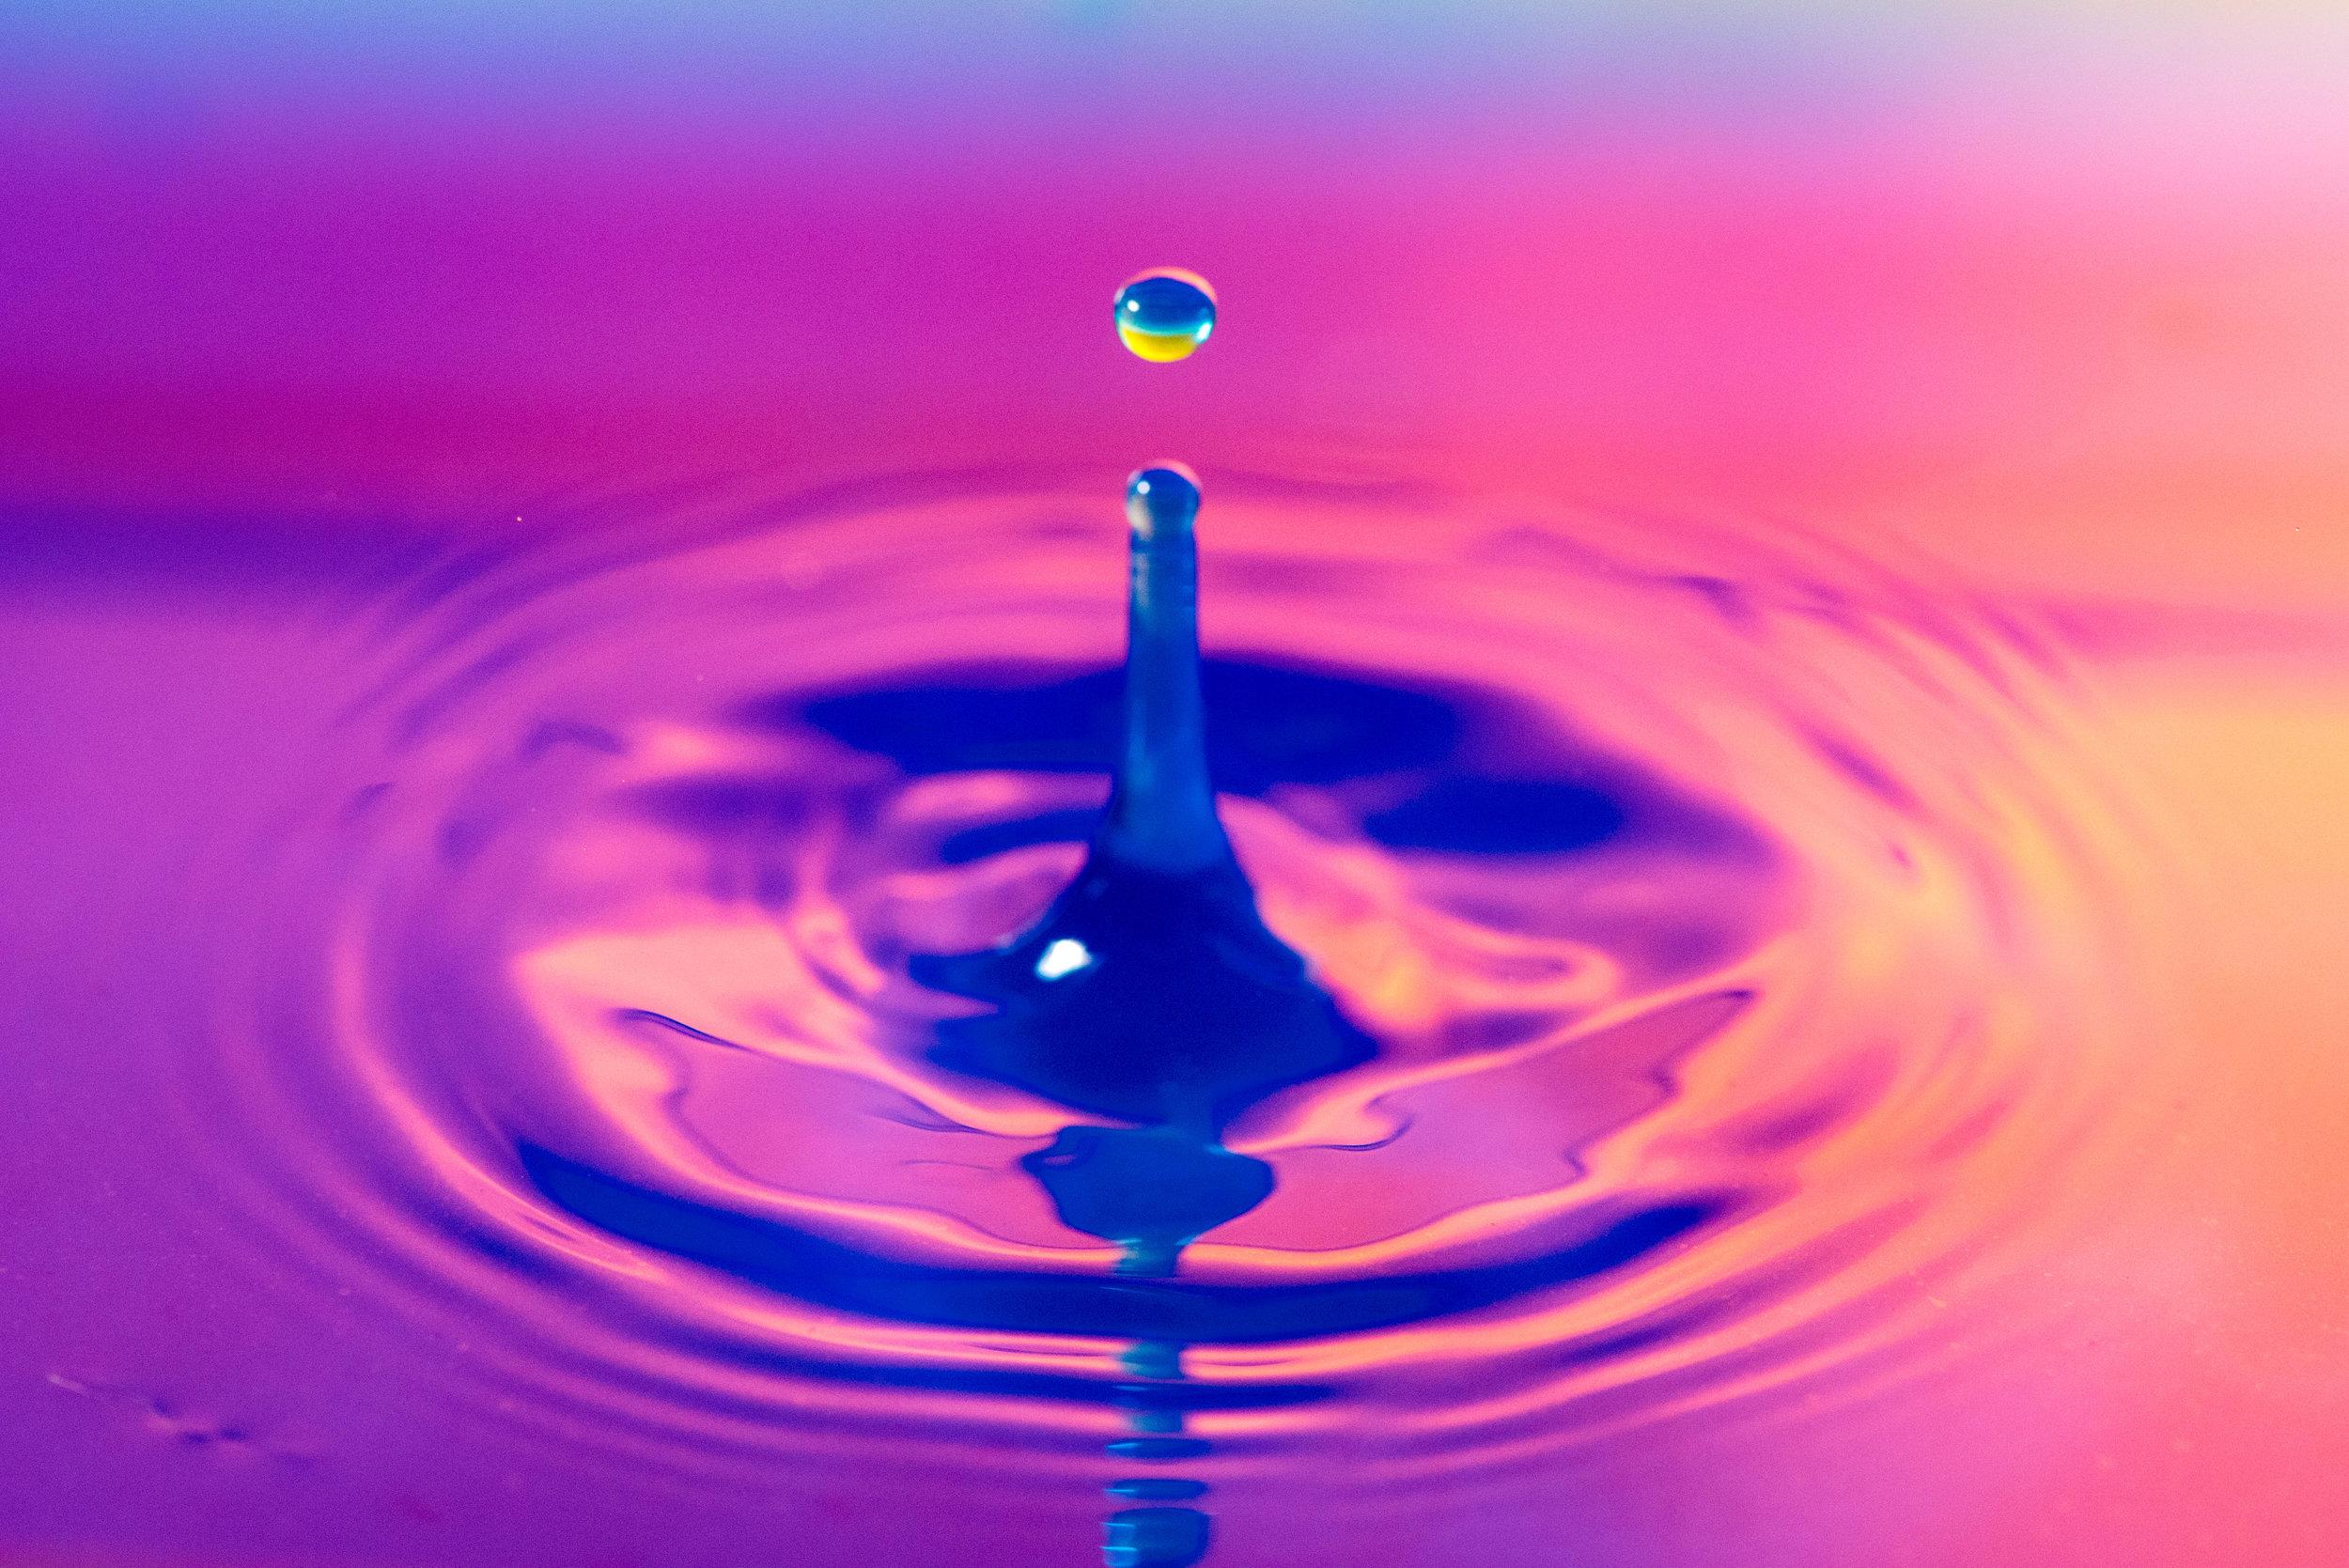 Facilitates Proper Hydration -